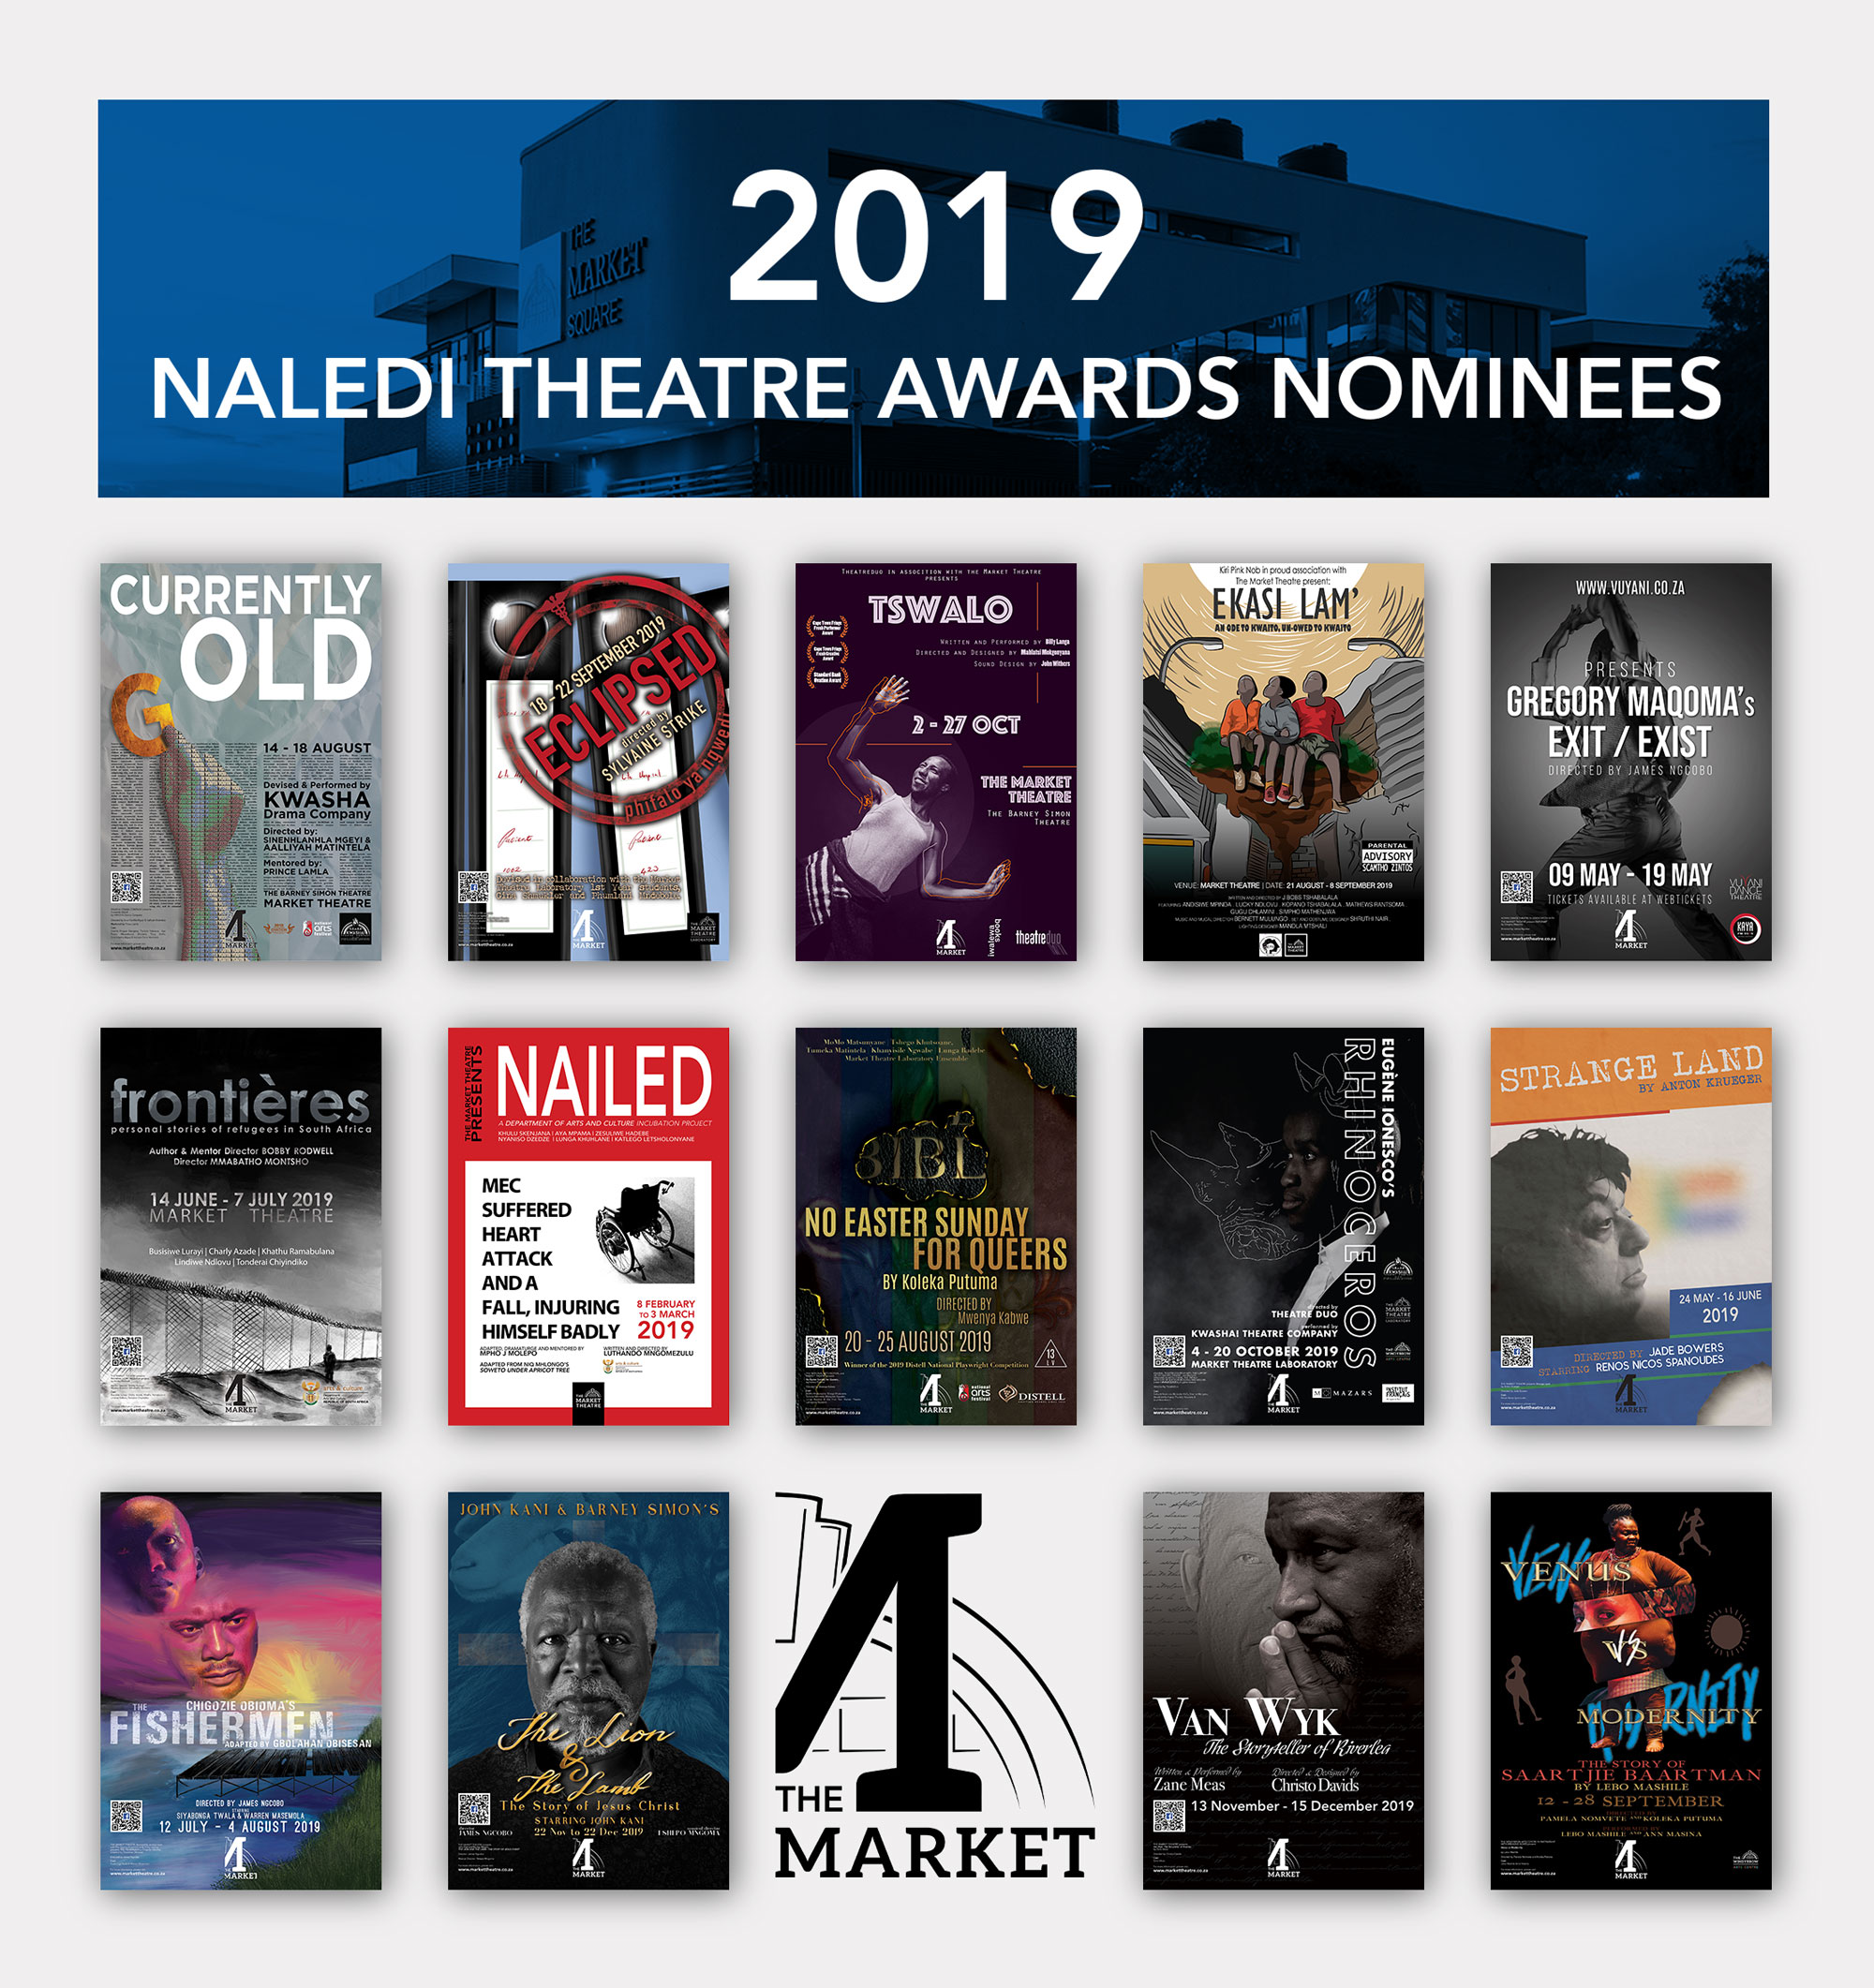 2019-naledi-theatre-awards-nominess